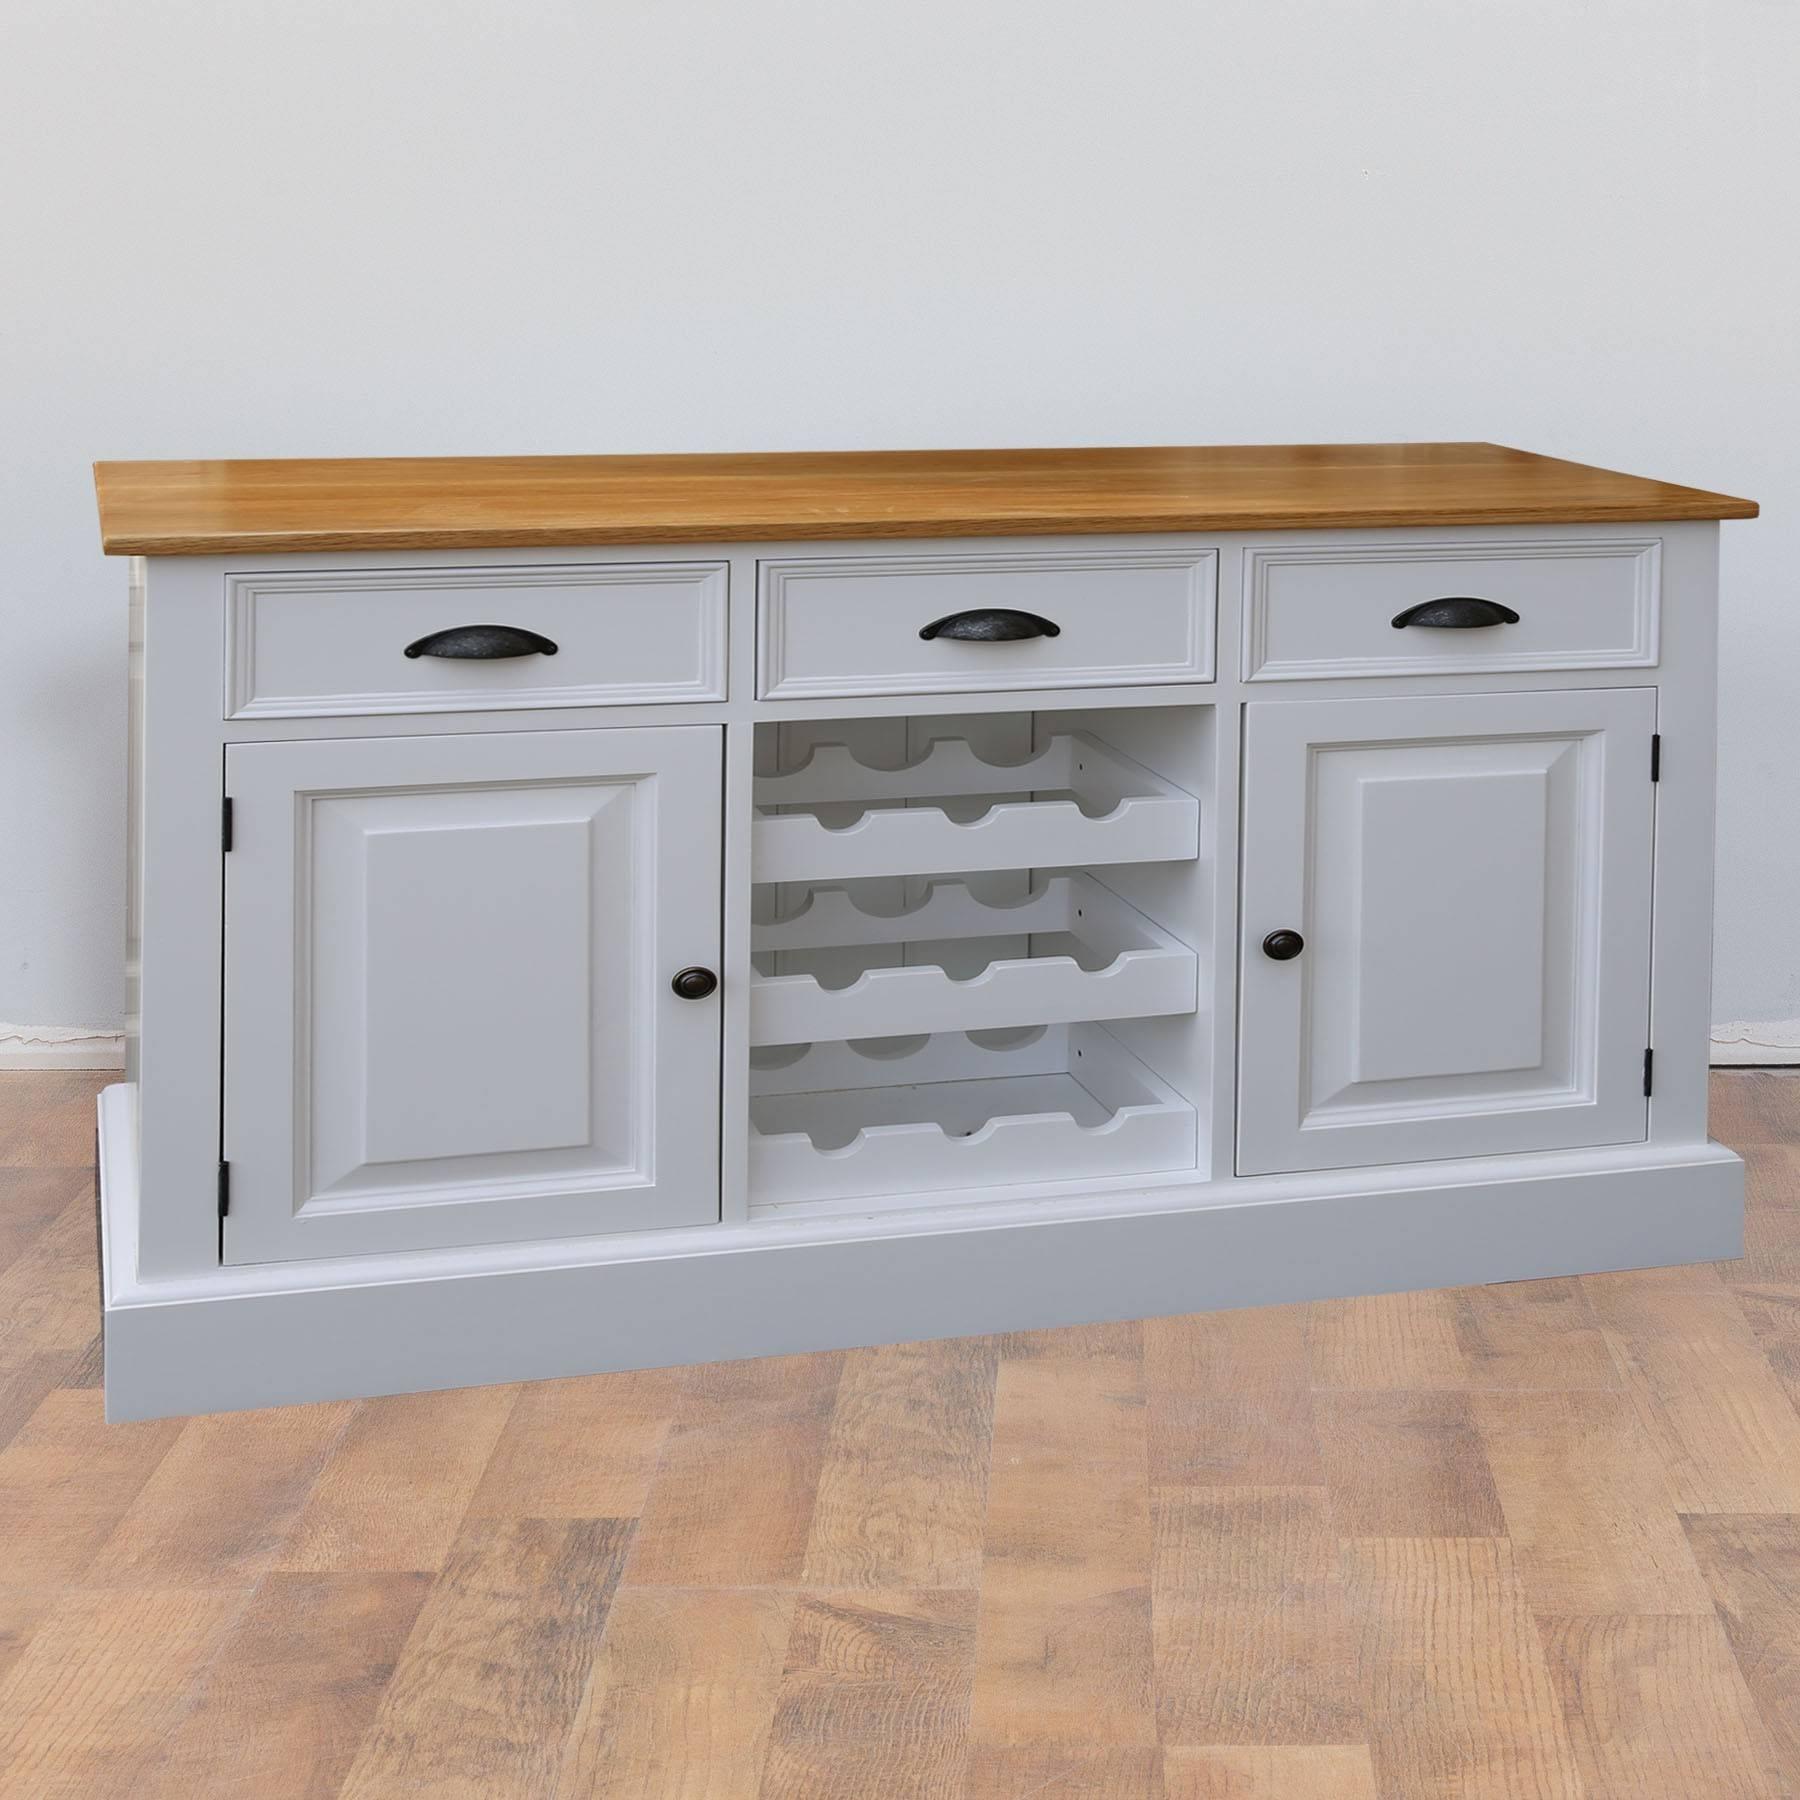 Mottisfont Solid Pine Painted Provence Sideboard | Furniture4Yourhome Inside Sideboards Uk Sale (#12 of 20)